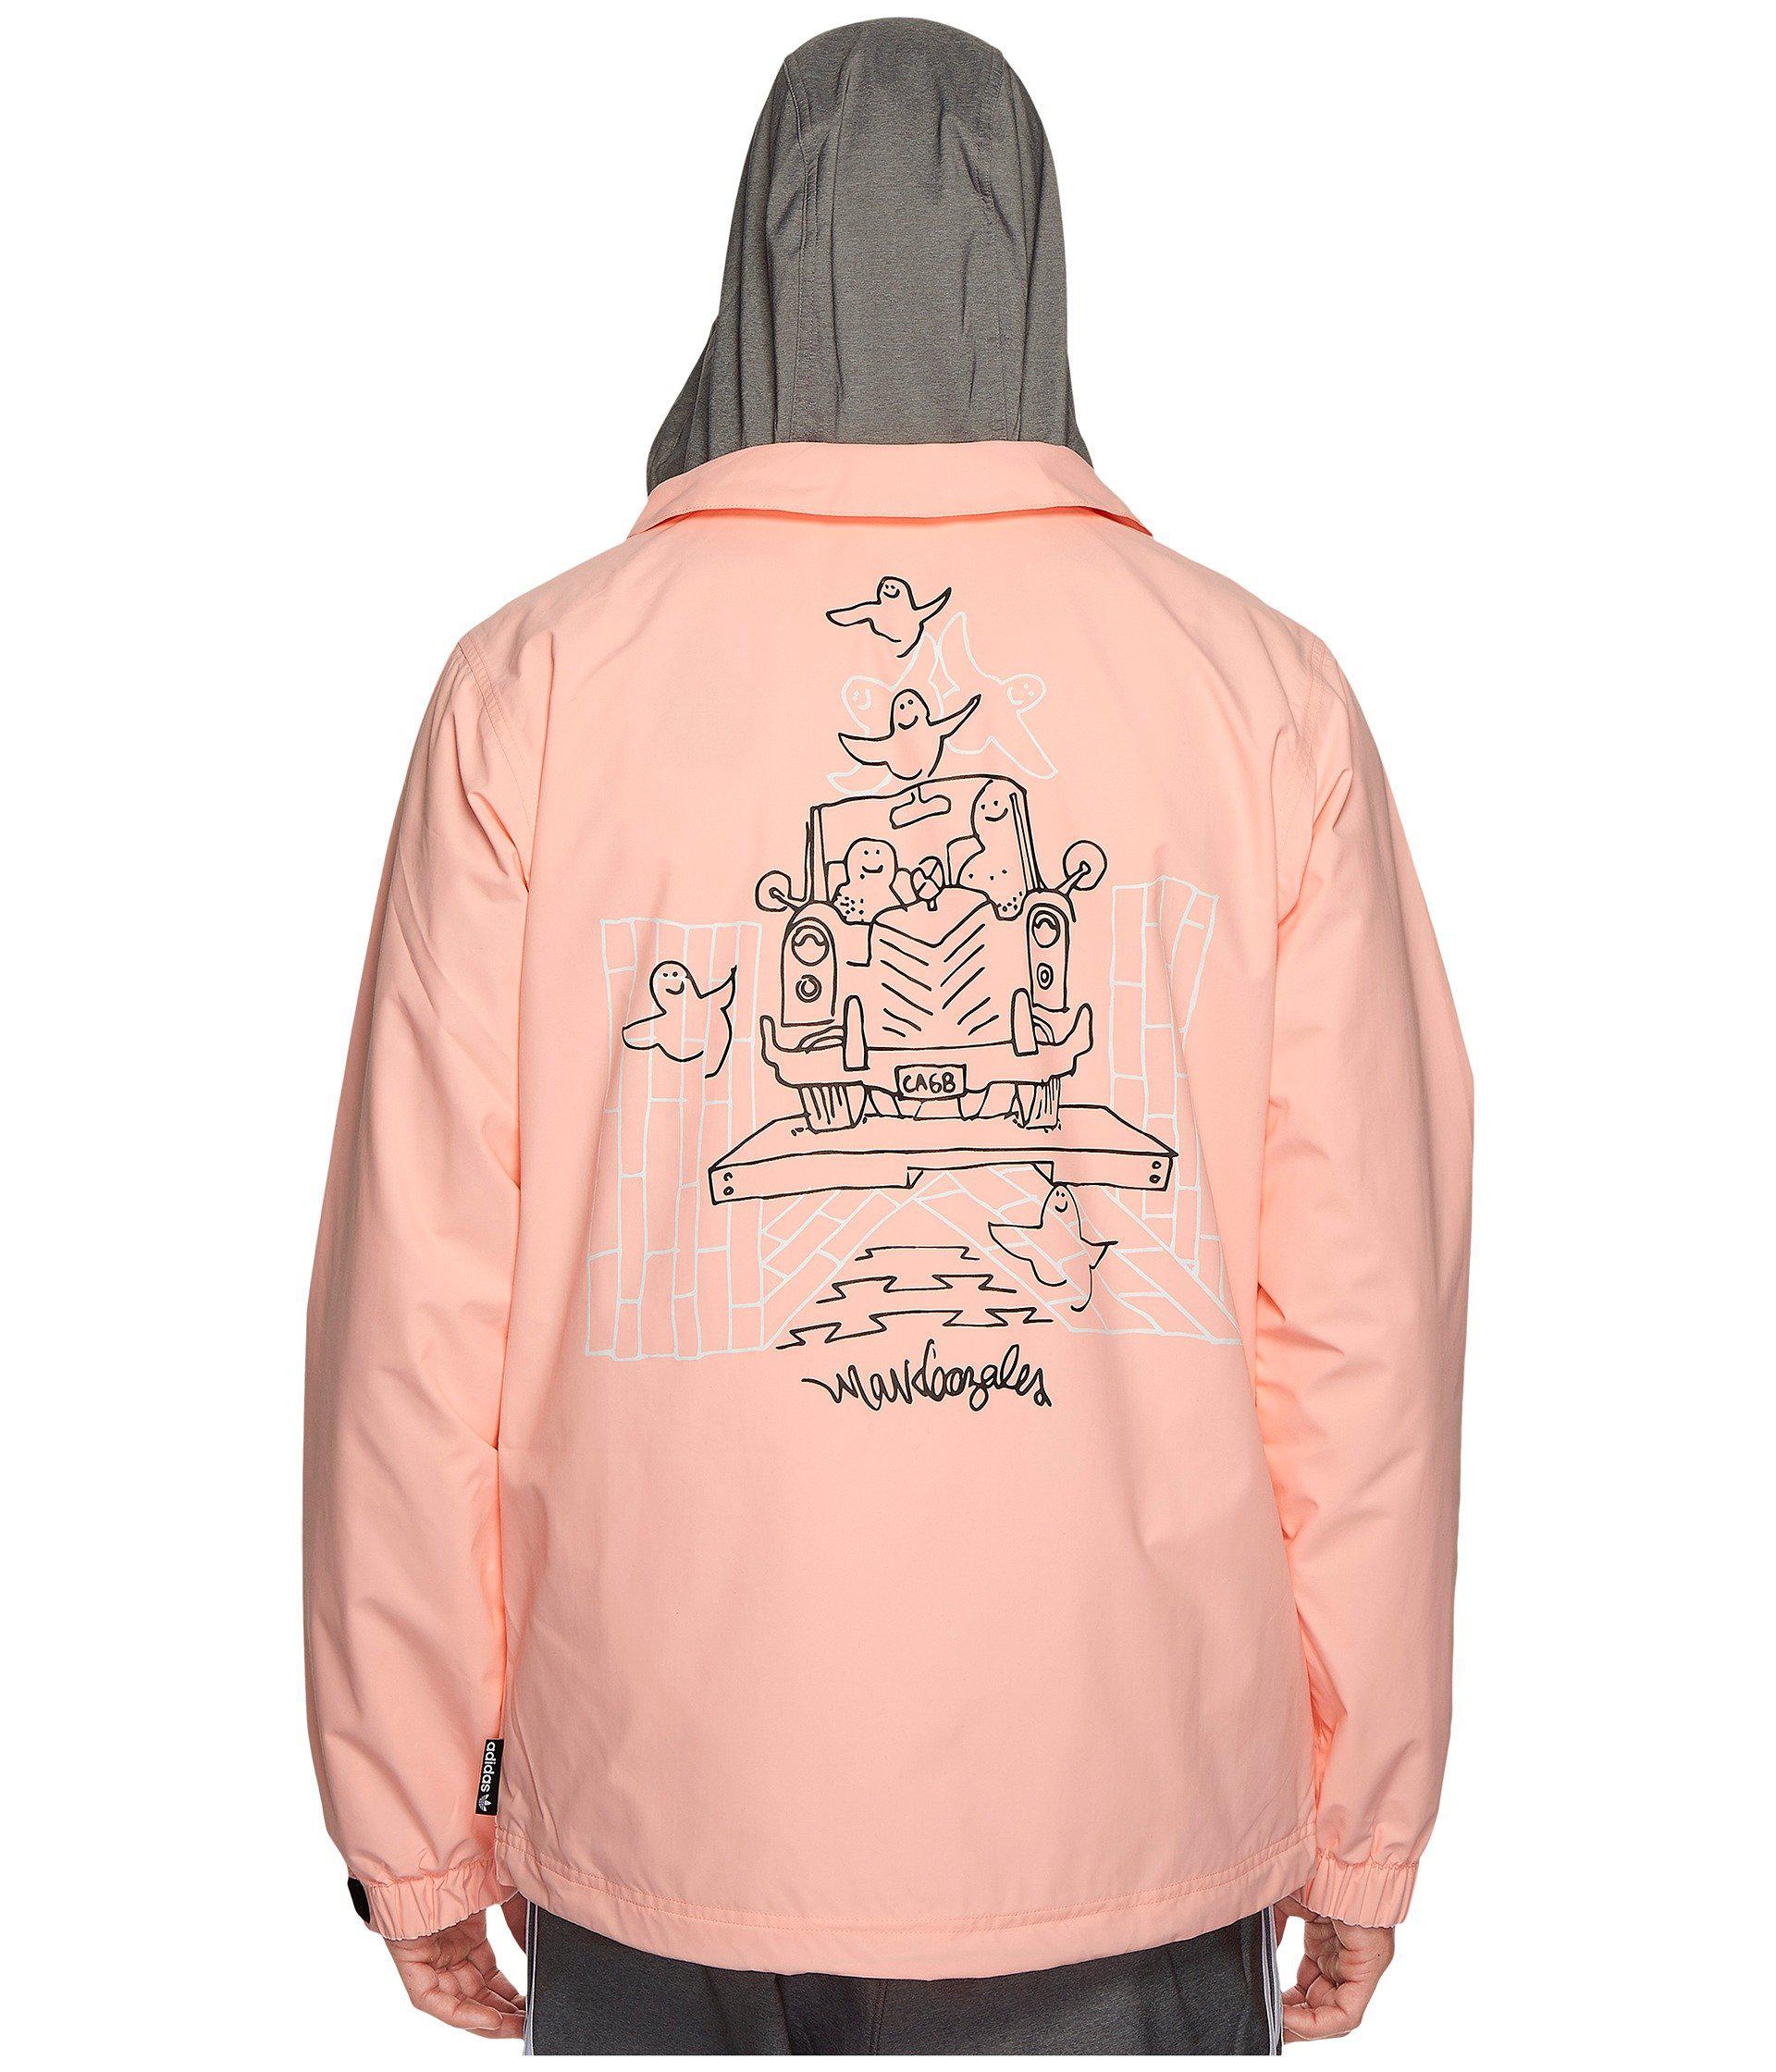 7bbbcd09630 Lyst - adidas Originals Civilian Gonz Jacket 2.0 in Pink for Men